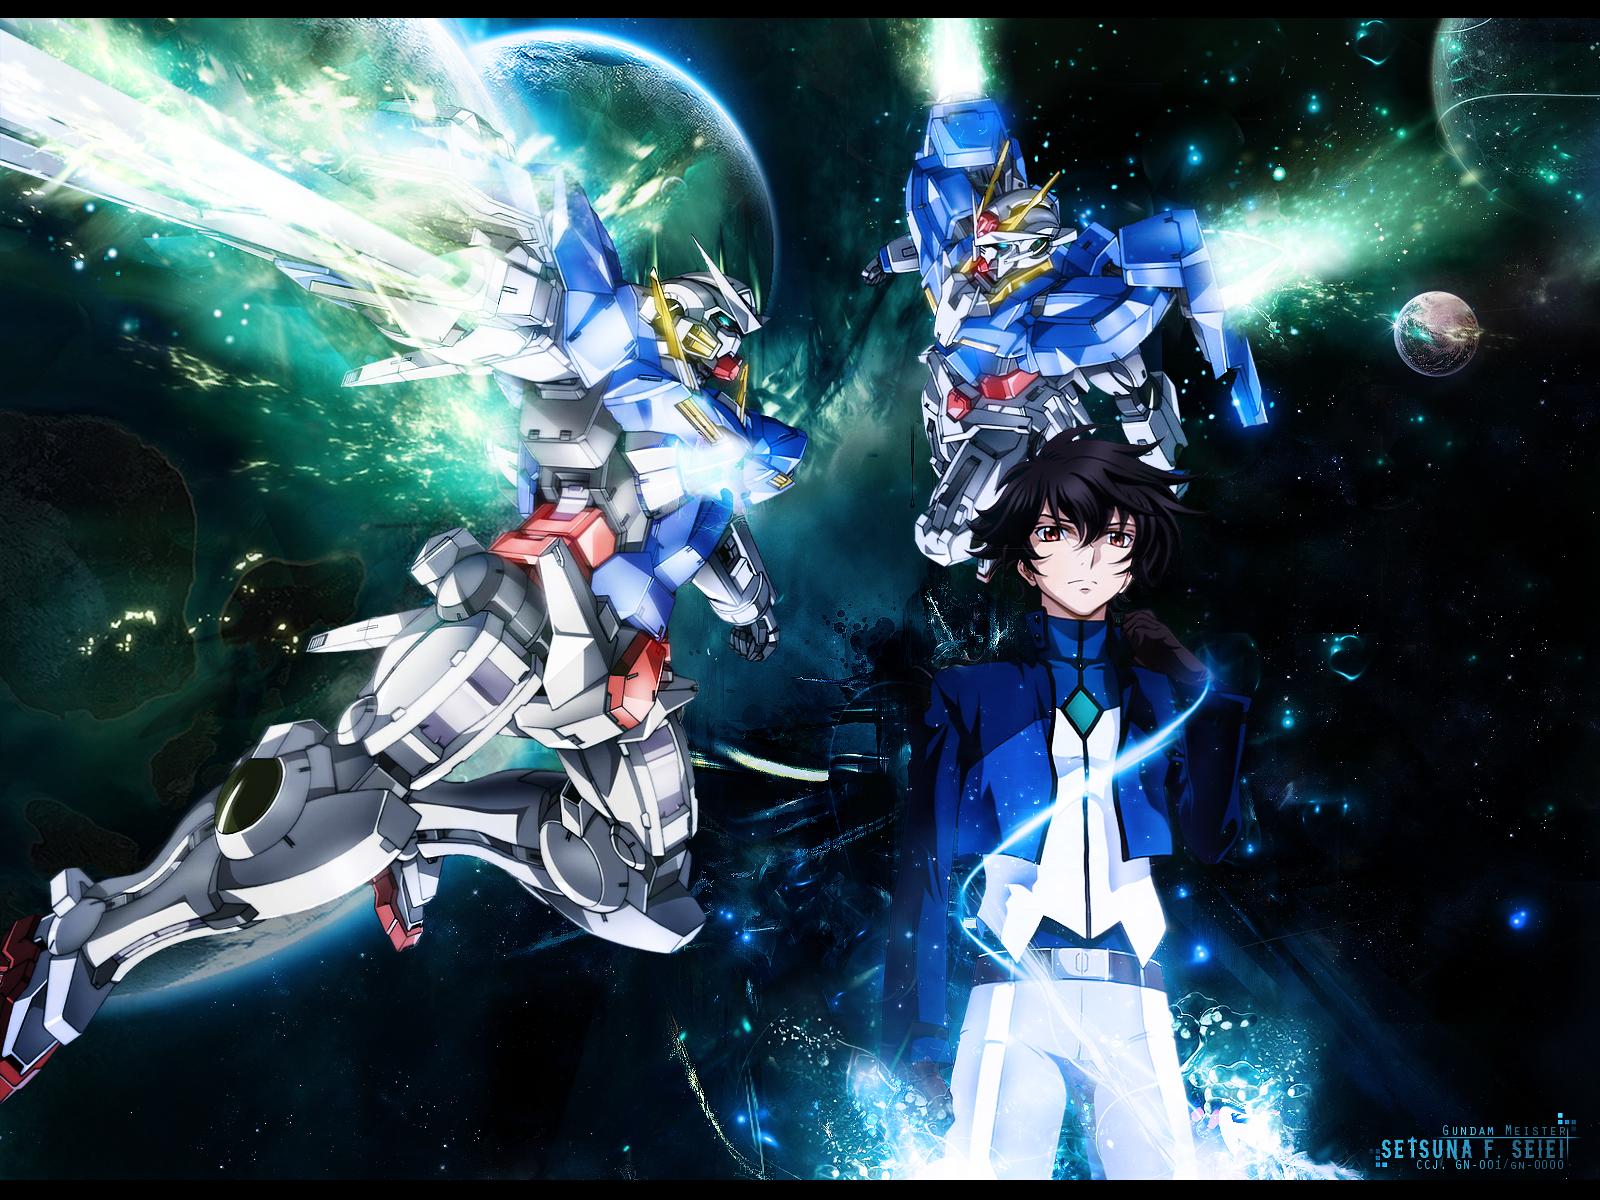 http://4.bp.blogspot.com/_AFPNTdm5dSw/TQ7HFN34N8I/AAAAAAAAAB0/WmrFIio_MIk/s1600/Gundam_00_Wallpaper_3__Setsuna_by_CCJ.jpg